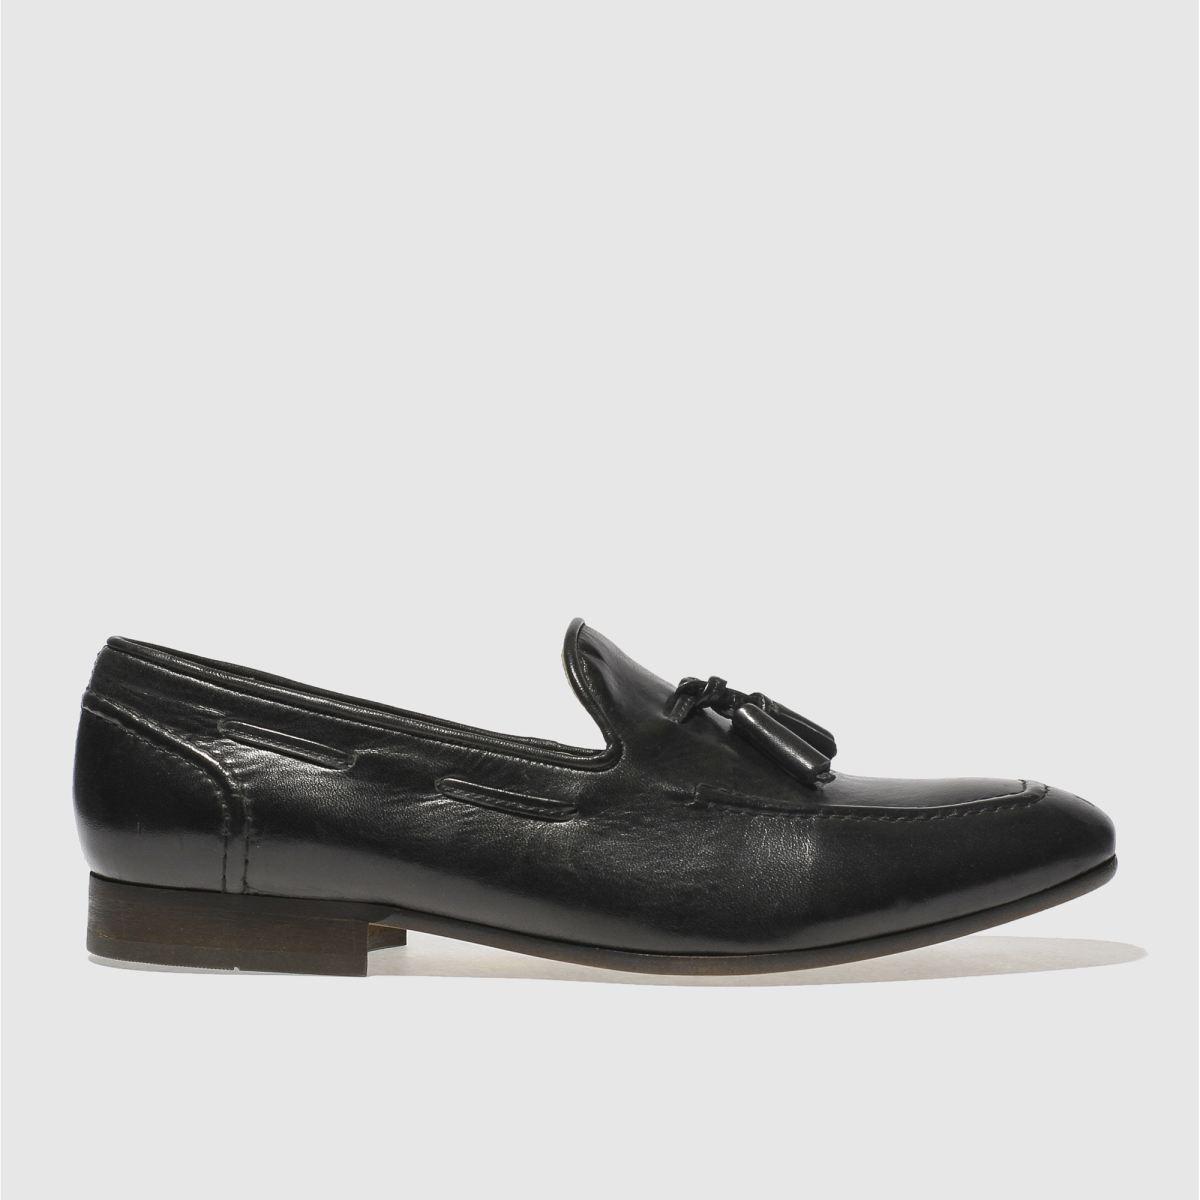 h by hudson black rene tassel shoes